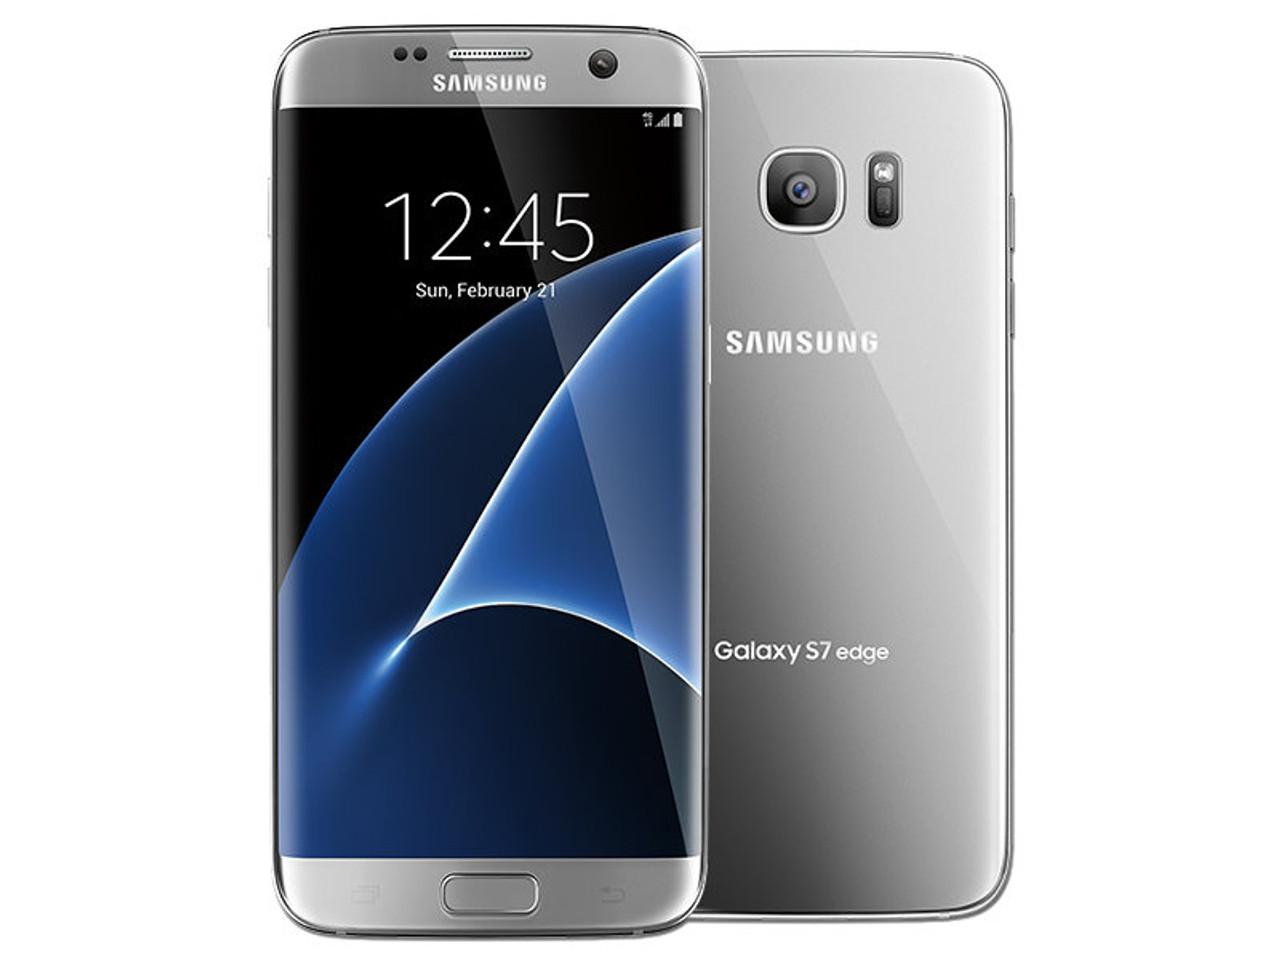 Galaxy S7 Edge Bad IMEI Repair Unblacklisting / Unblocking Service